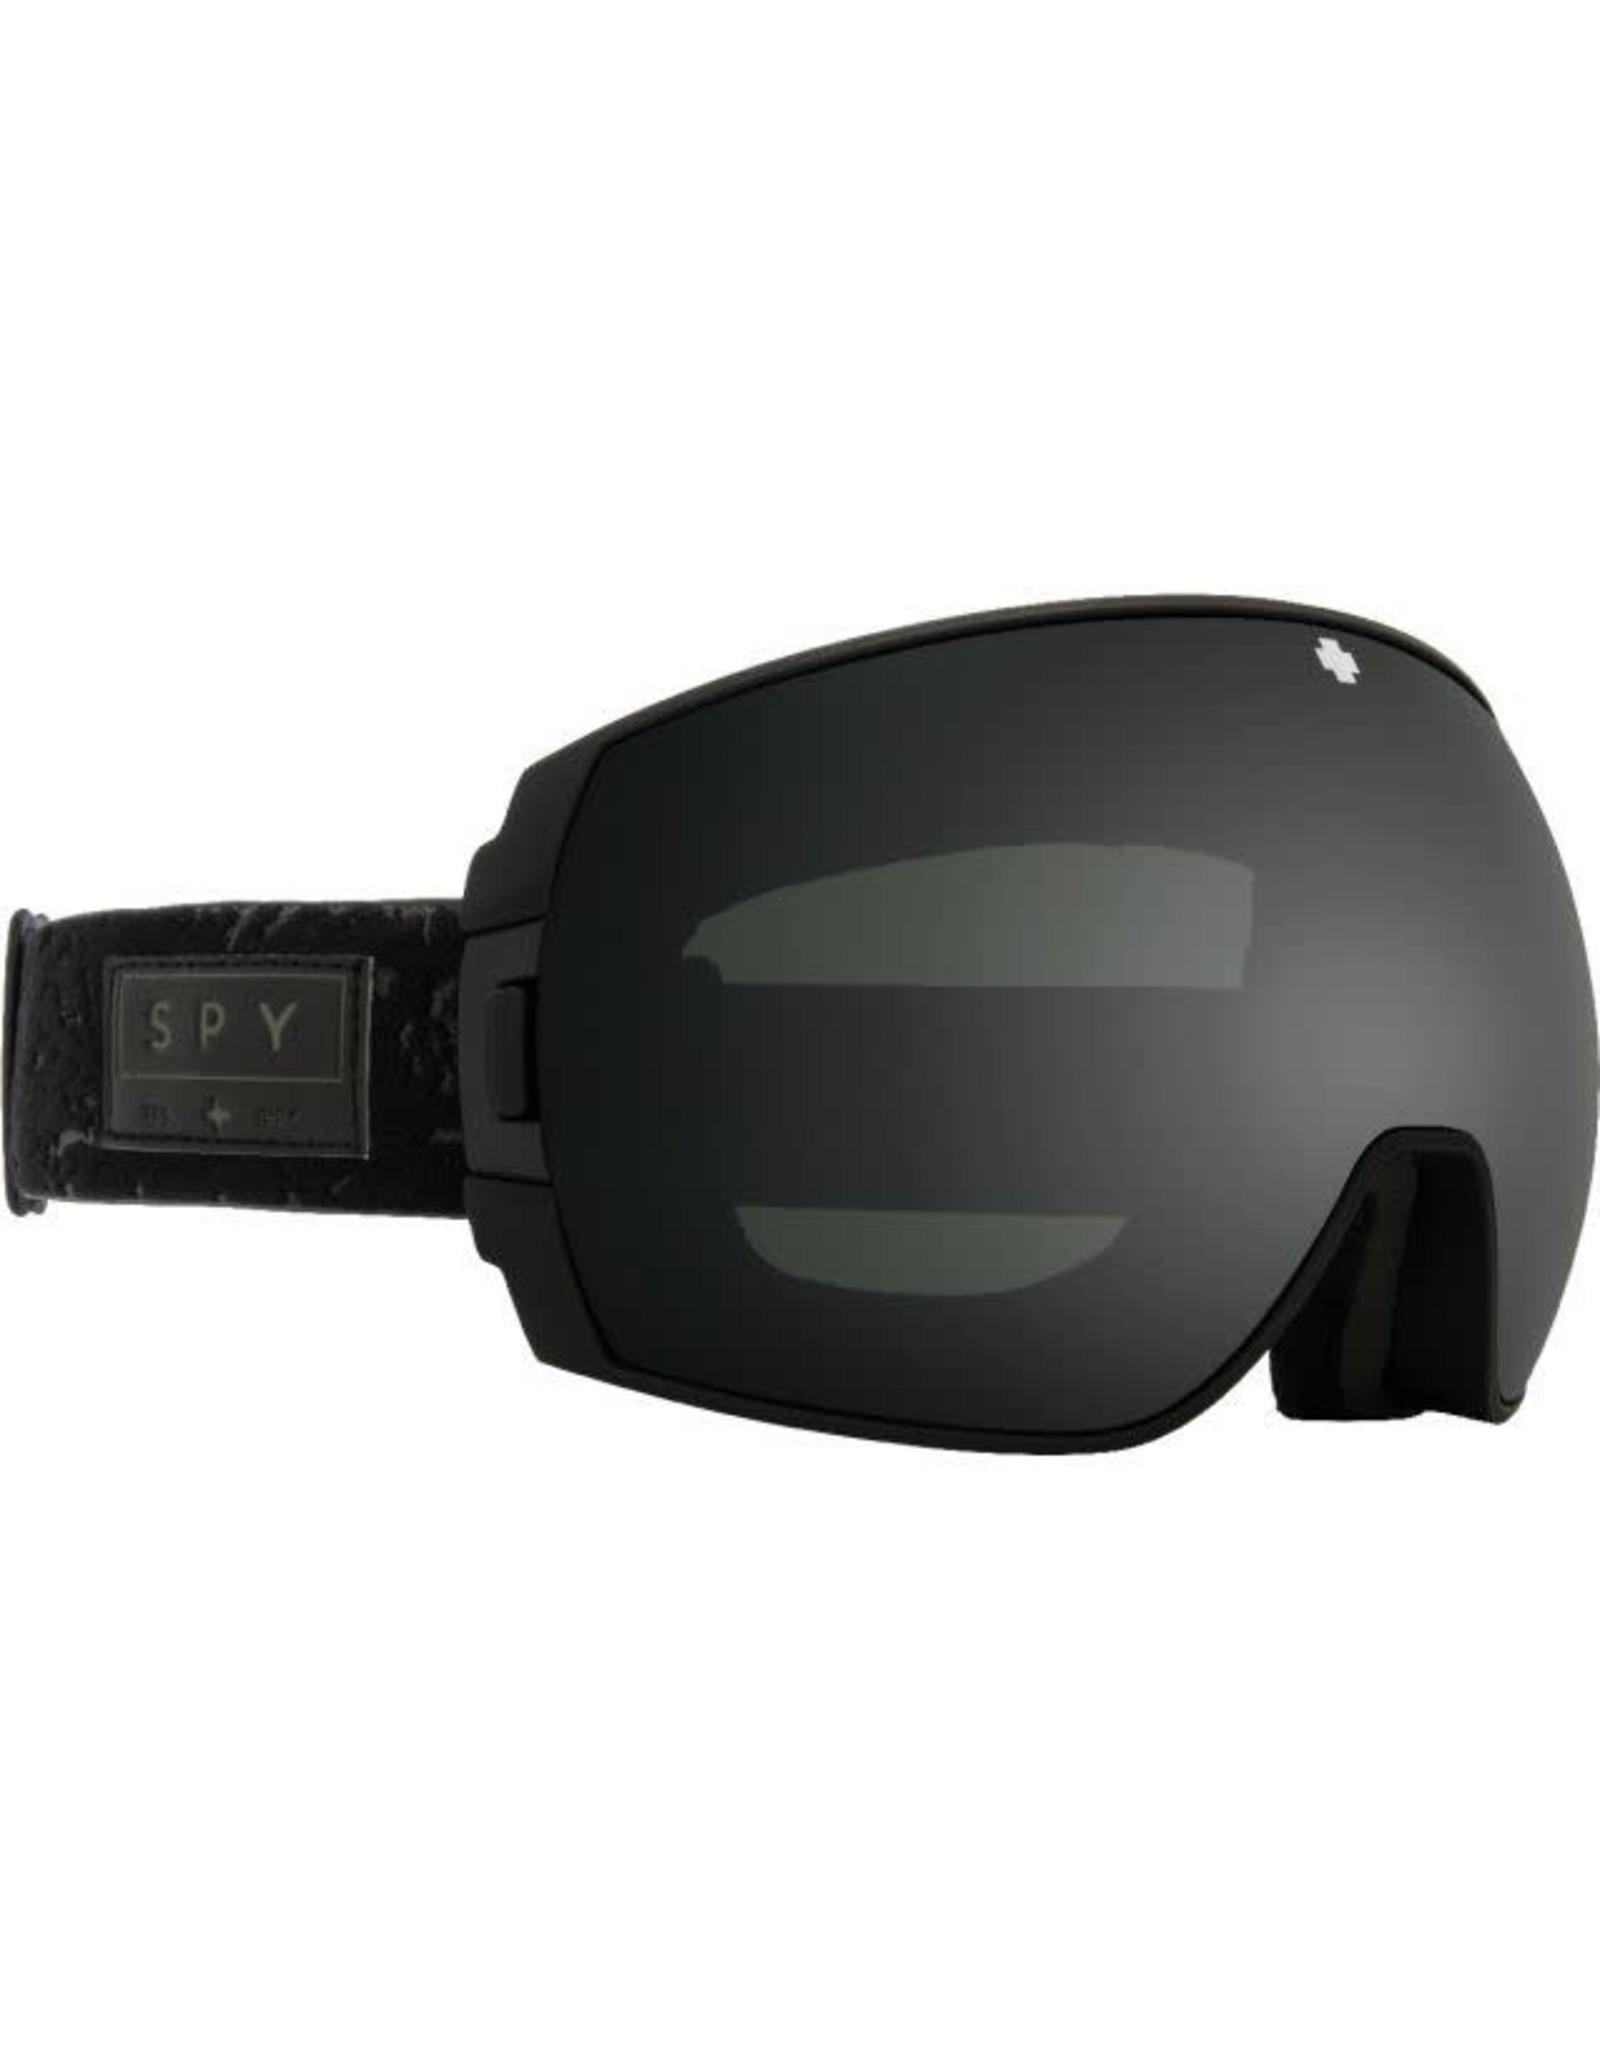 SPY+ Legacy Snow Goggle